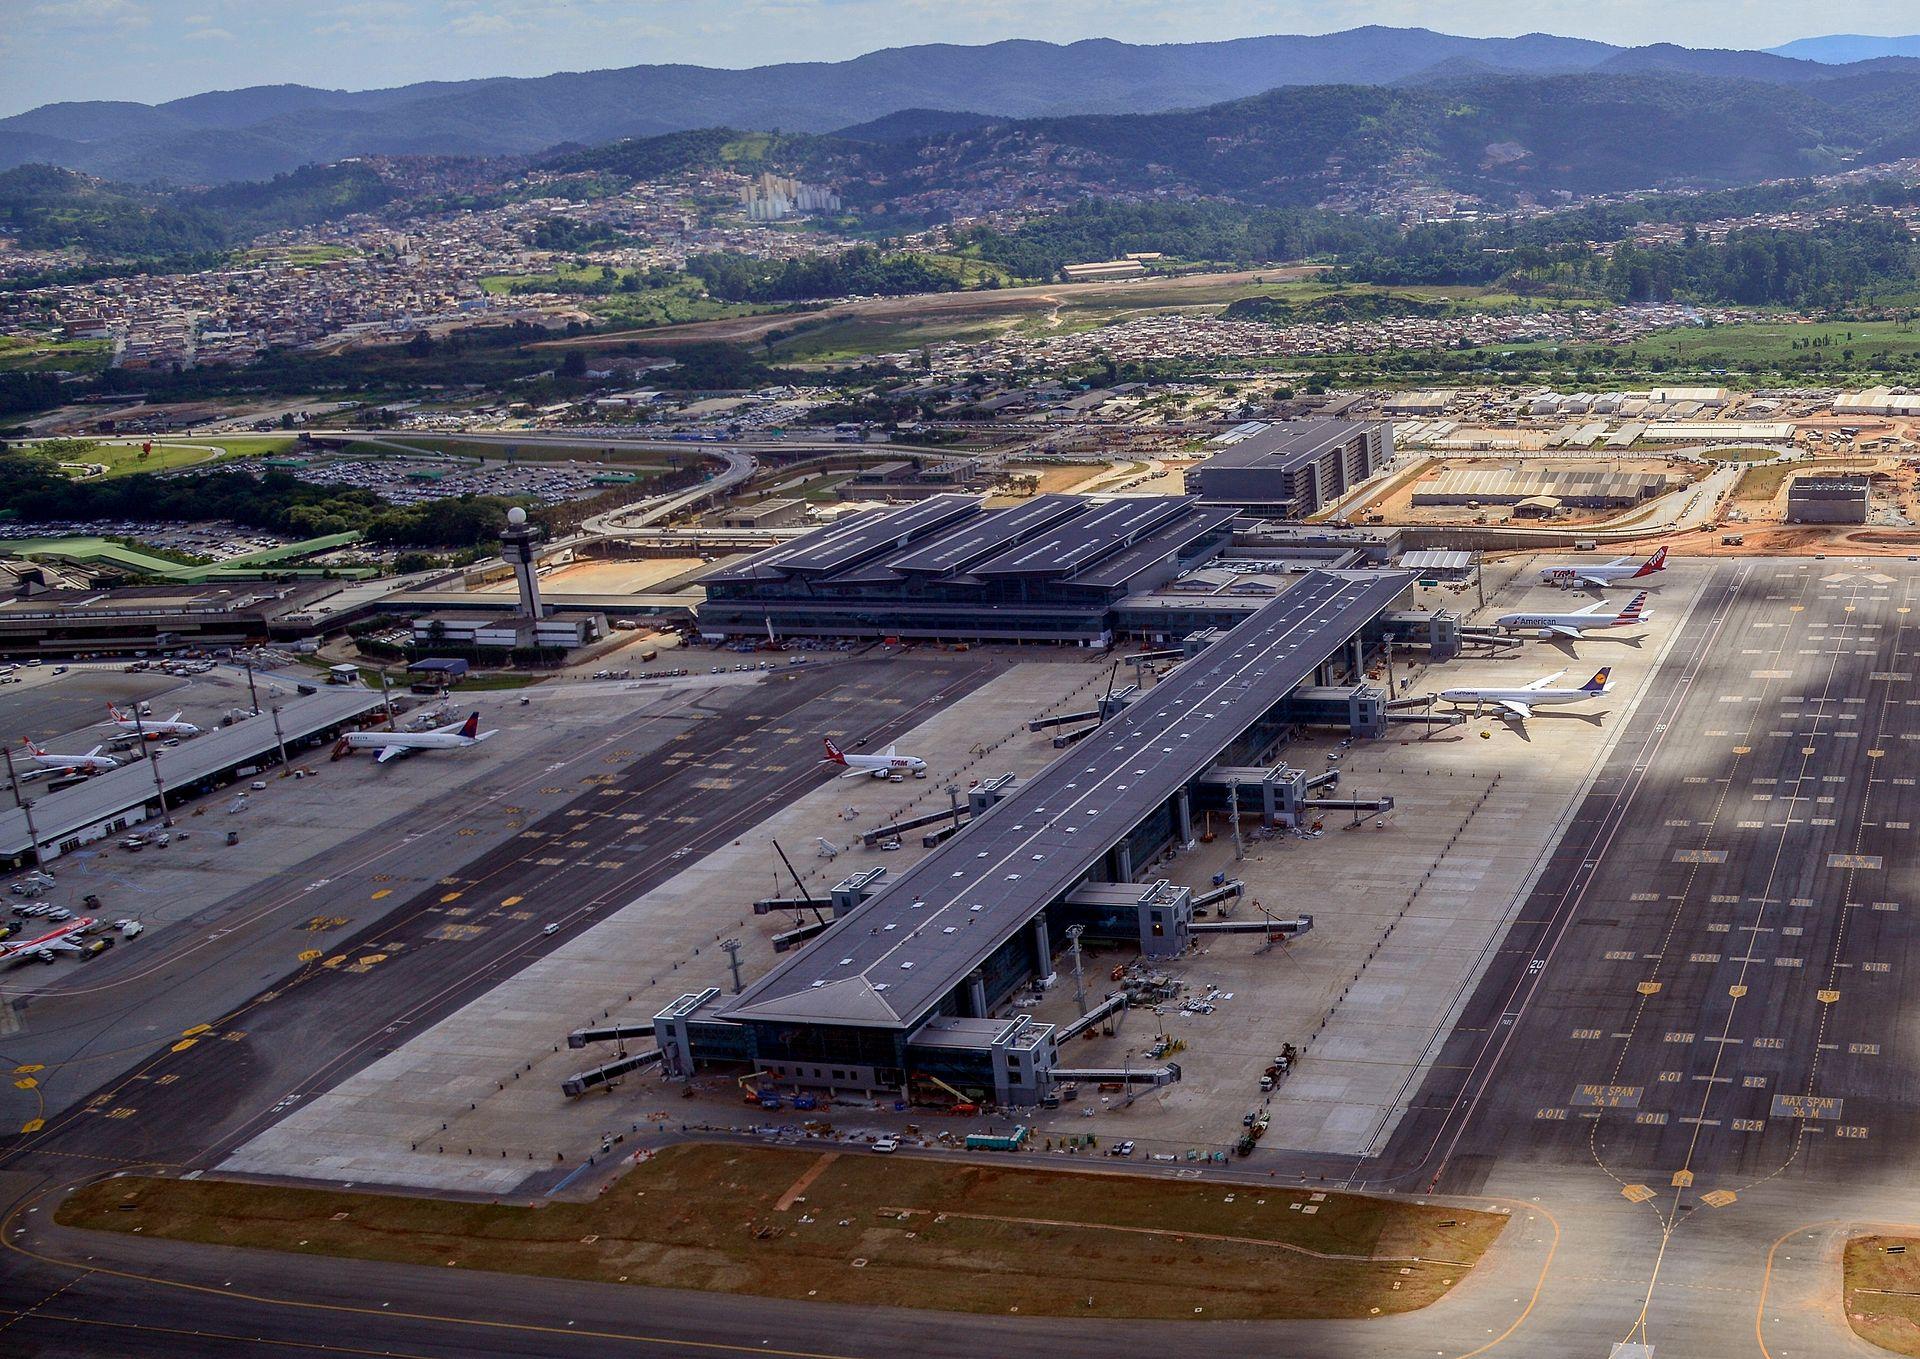 Flughafen Sao Paulo Ankunft